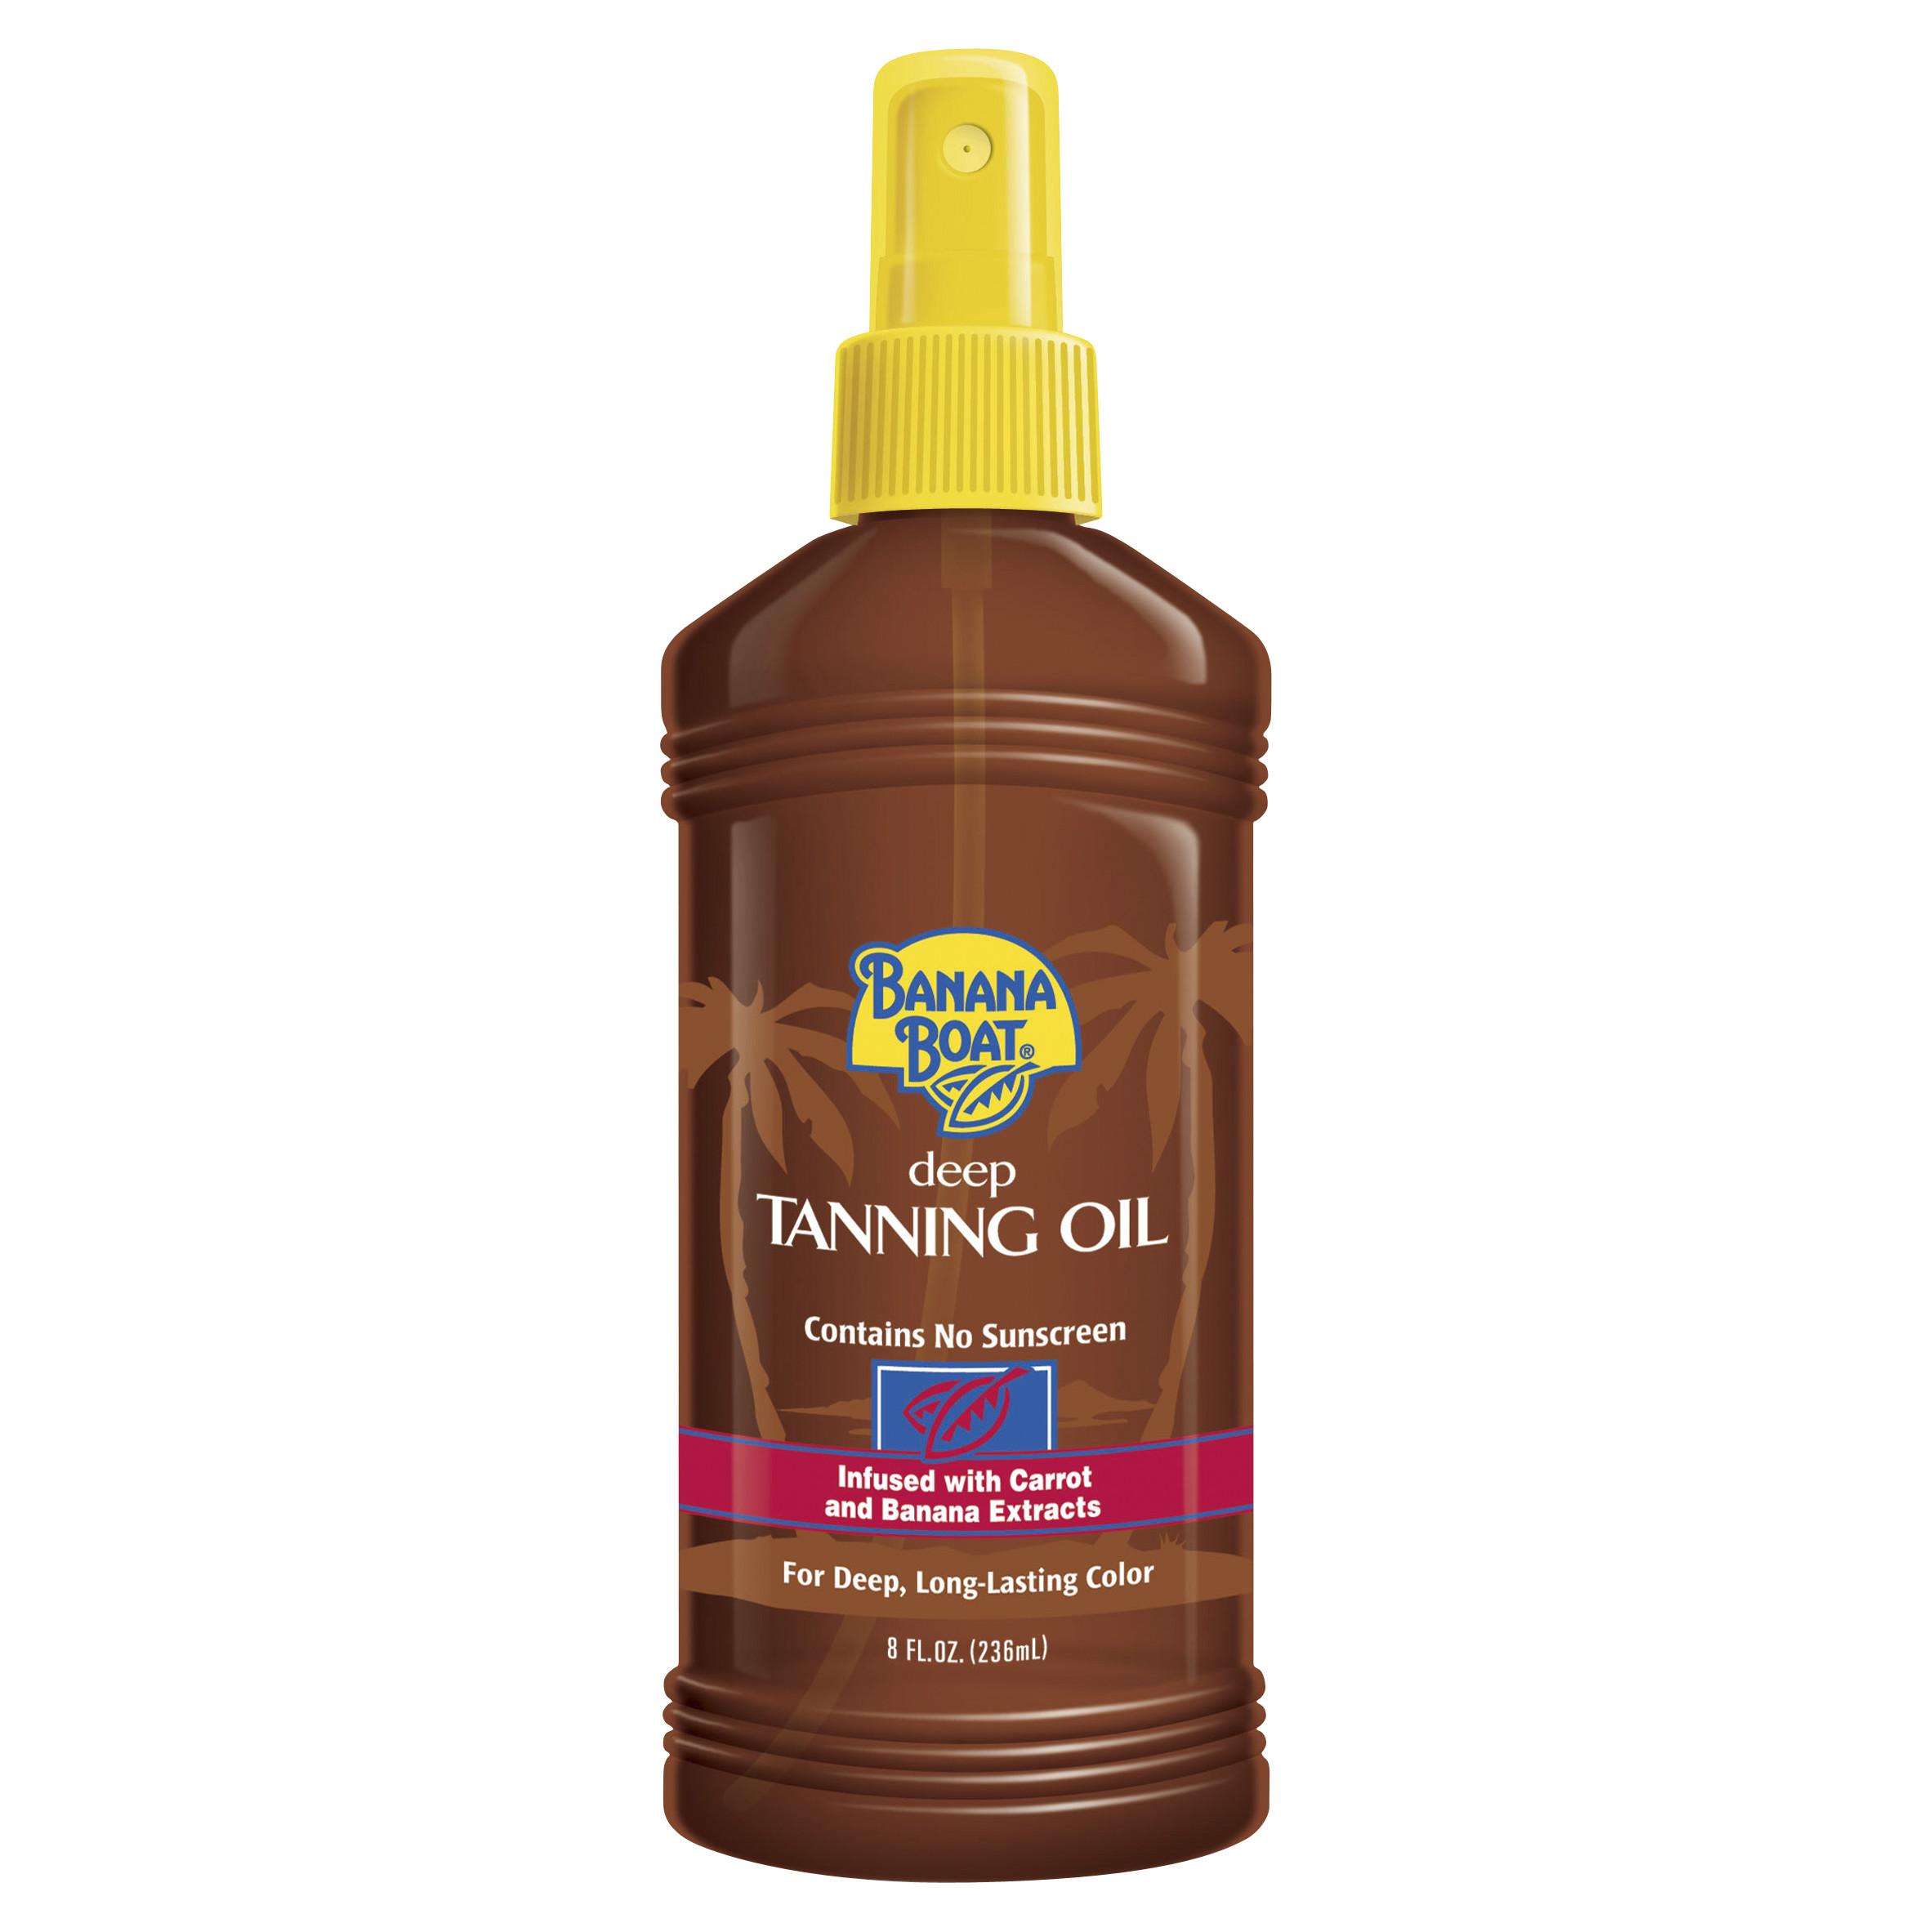 Banana Boat Deep Tanning Oil Pump Spray - 8 Ounces